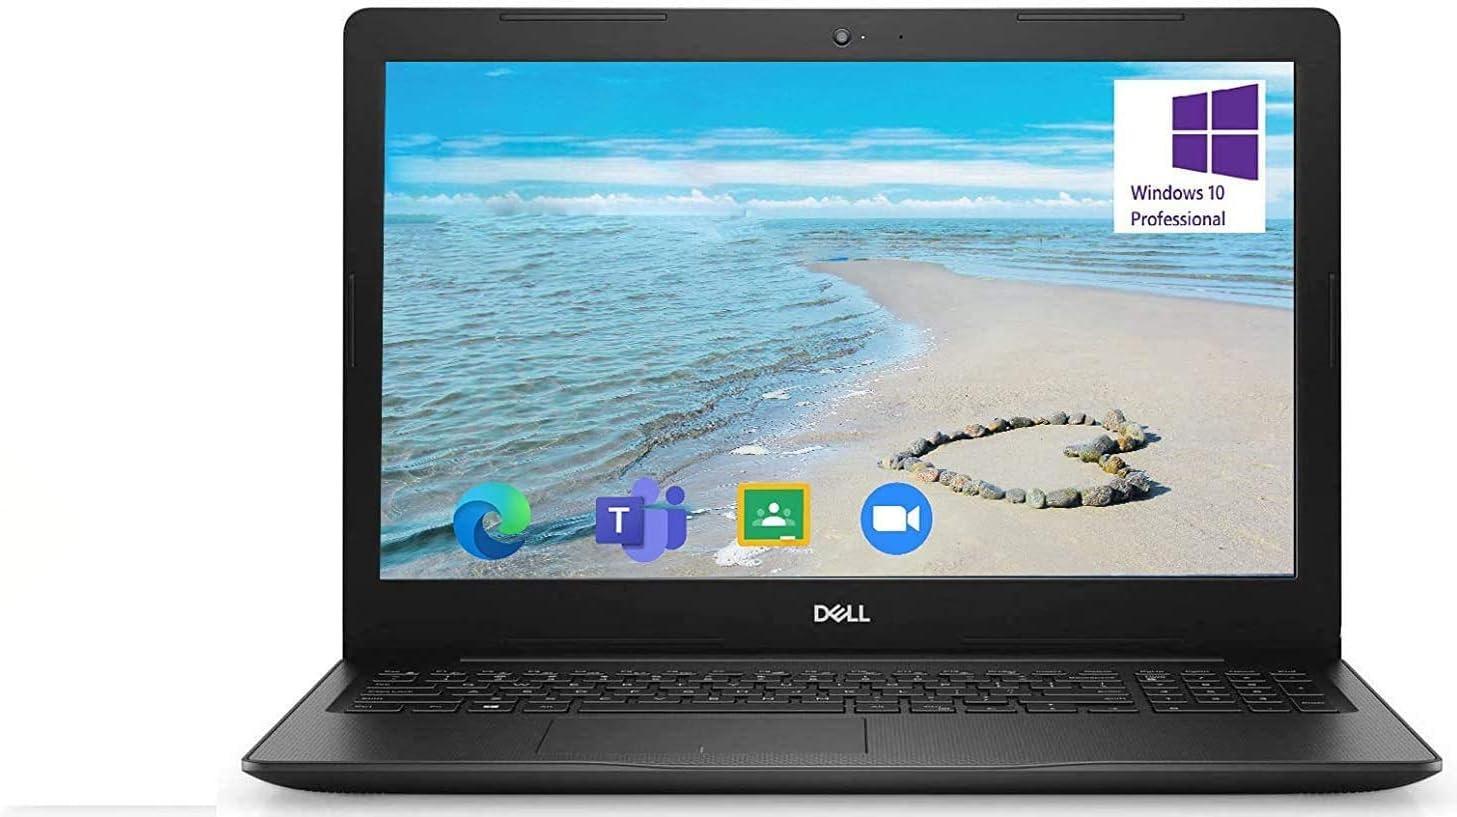 Newest Dell Inspiron 15.6 inch Laptop, 10th Gen Intel Core i5-1035G1, 16GB RAM, 512GB SSD, HDMI, WiFi, Intel UHD Graphics, Bluetooth, Online Class Windows 10 Pro